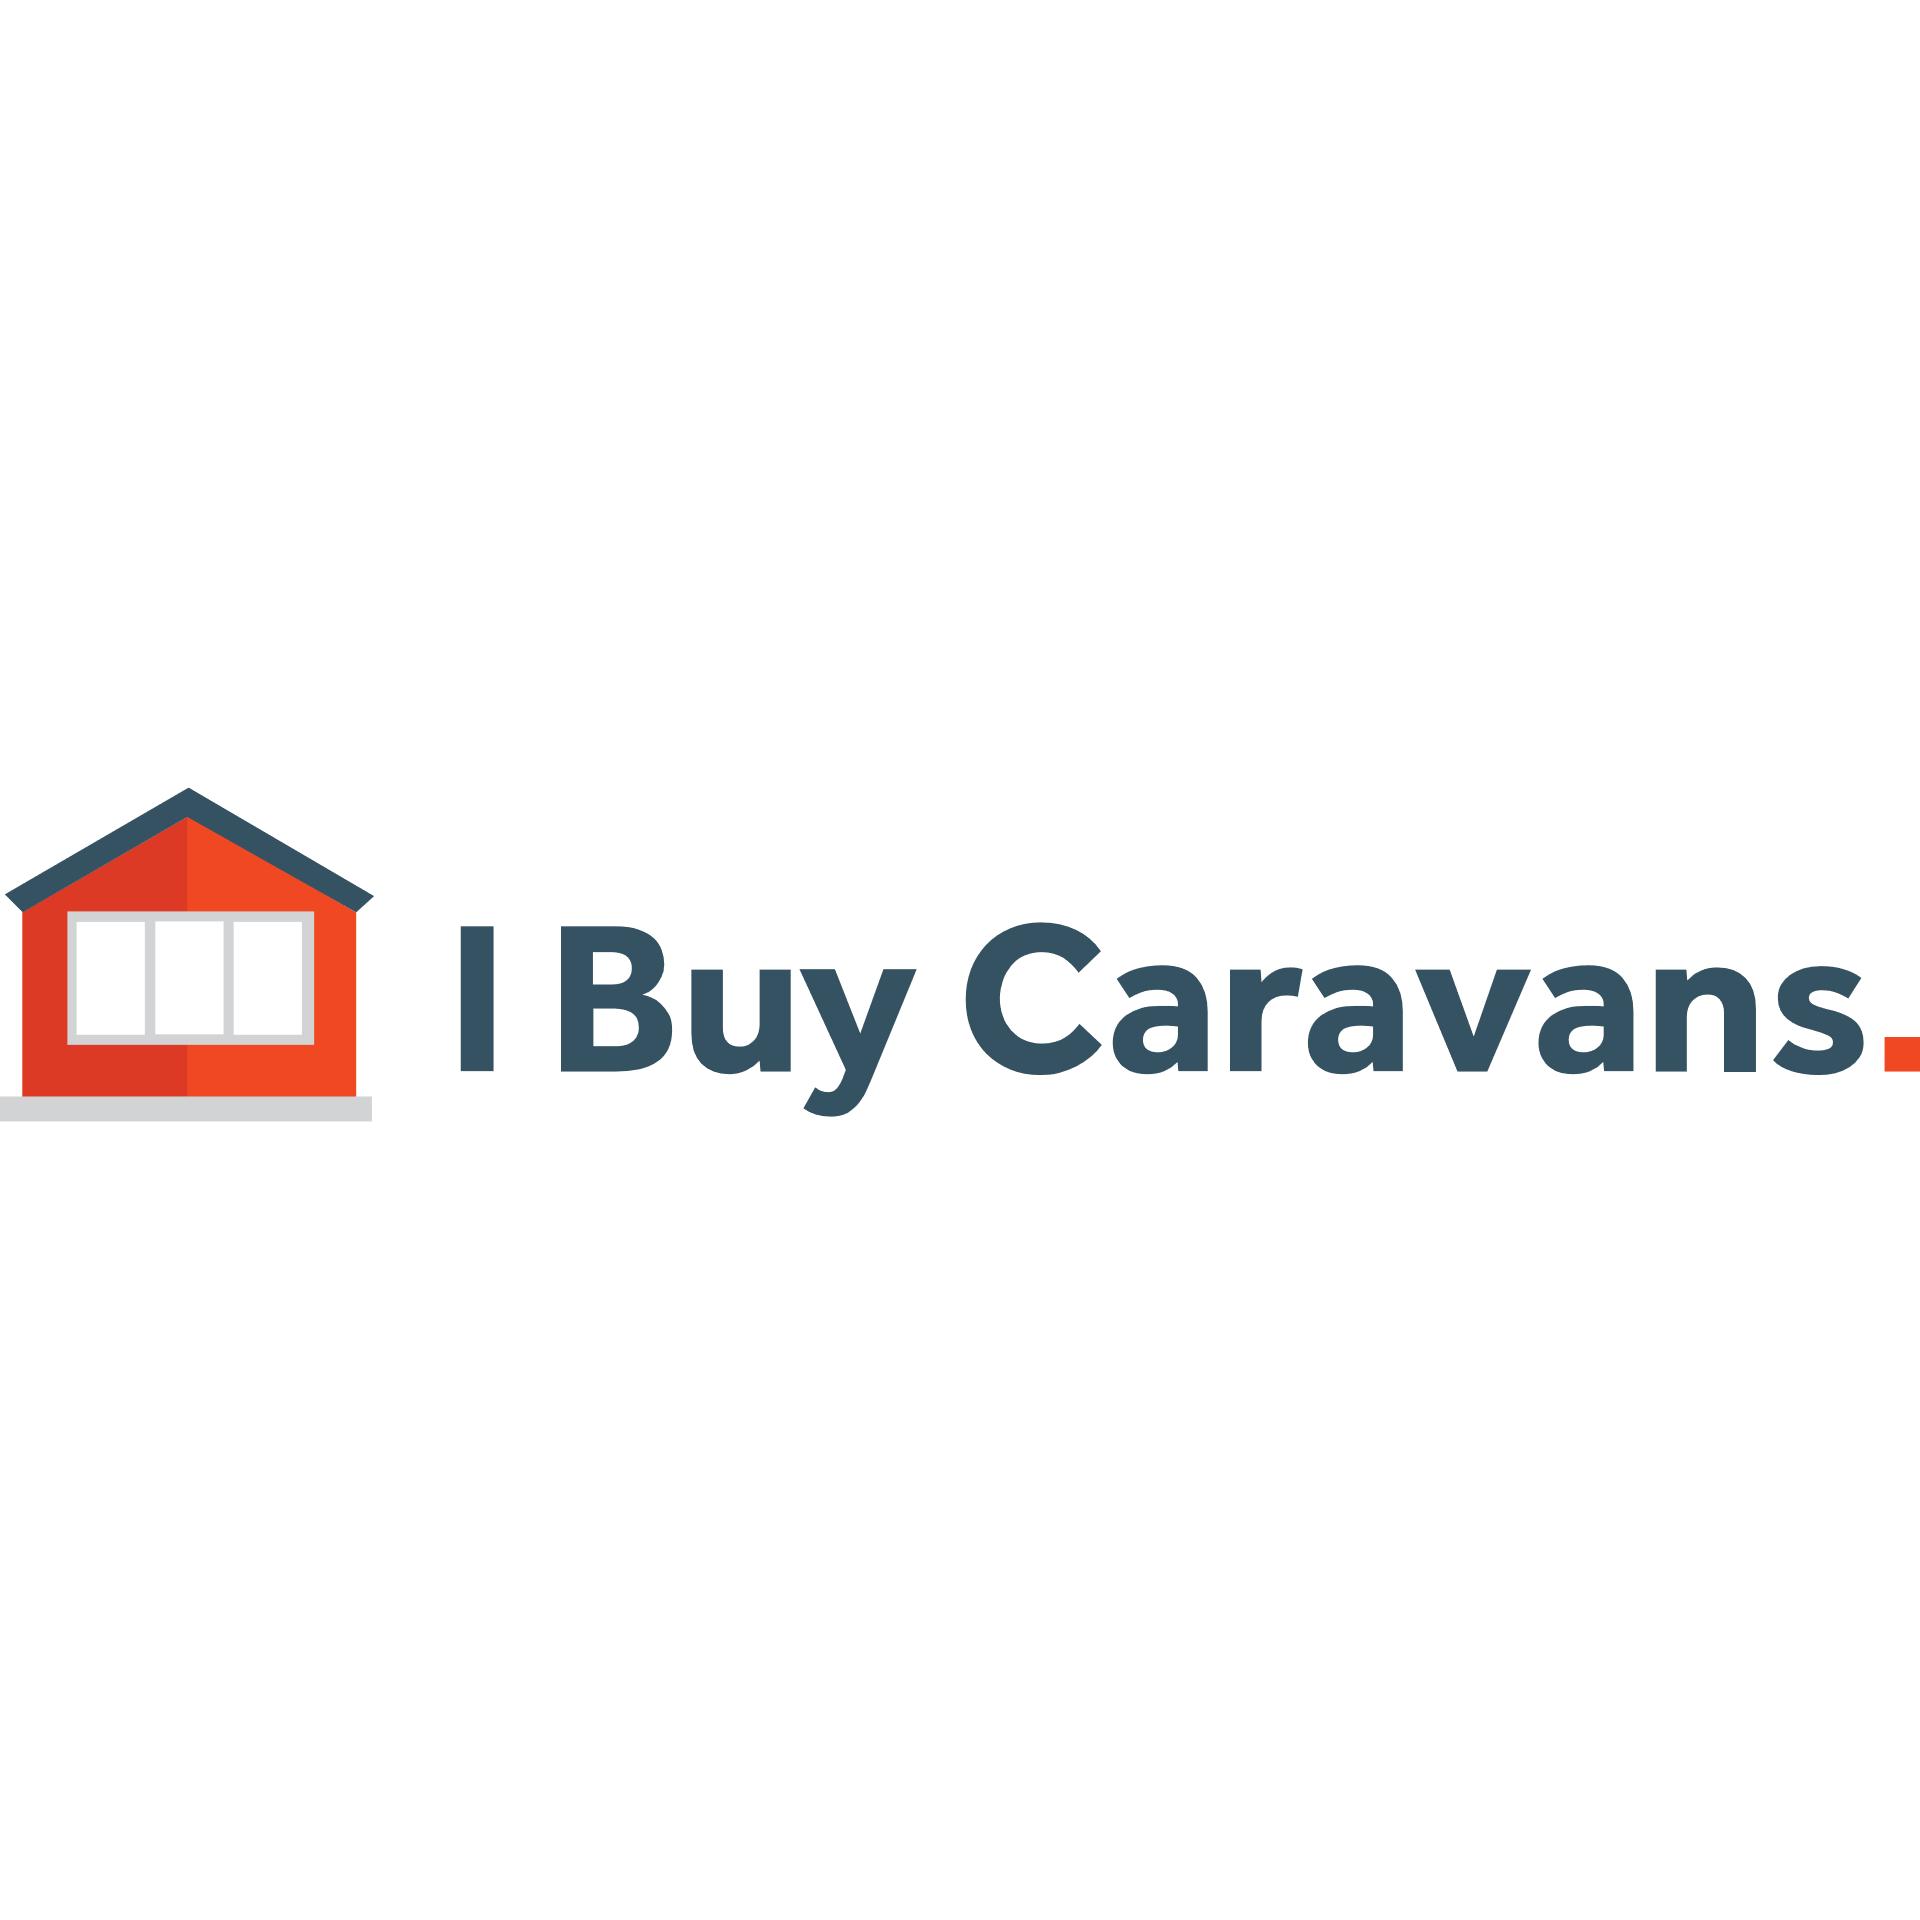 I buy Caravans